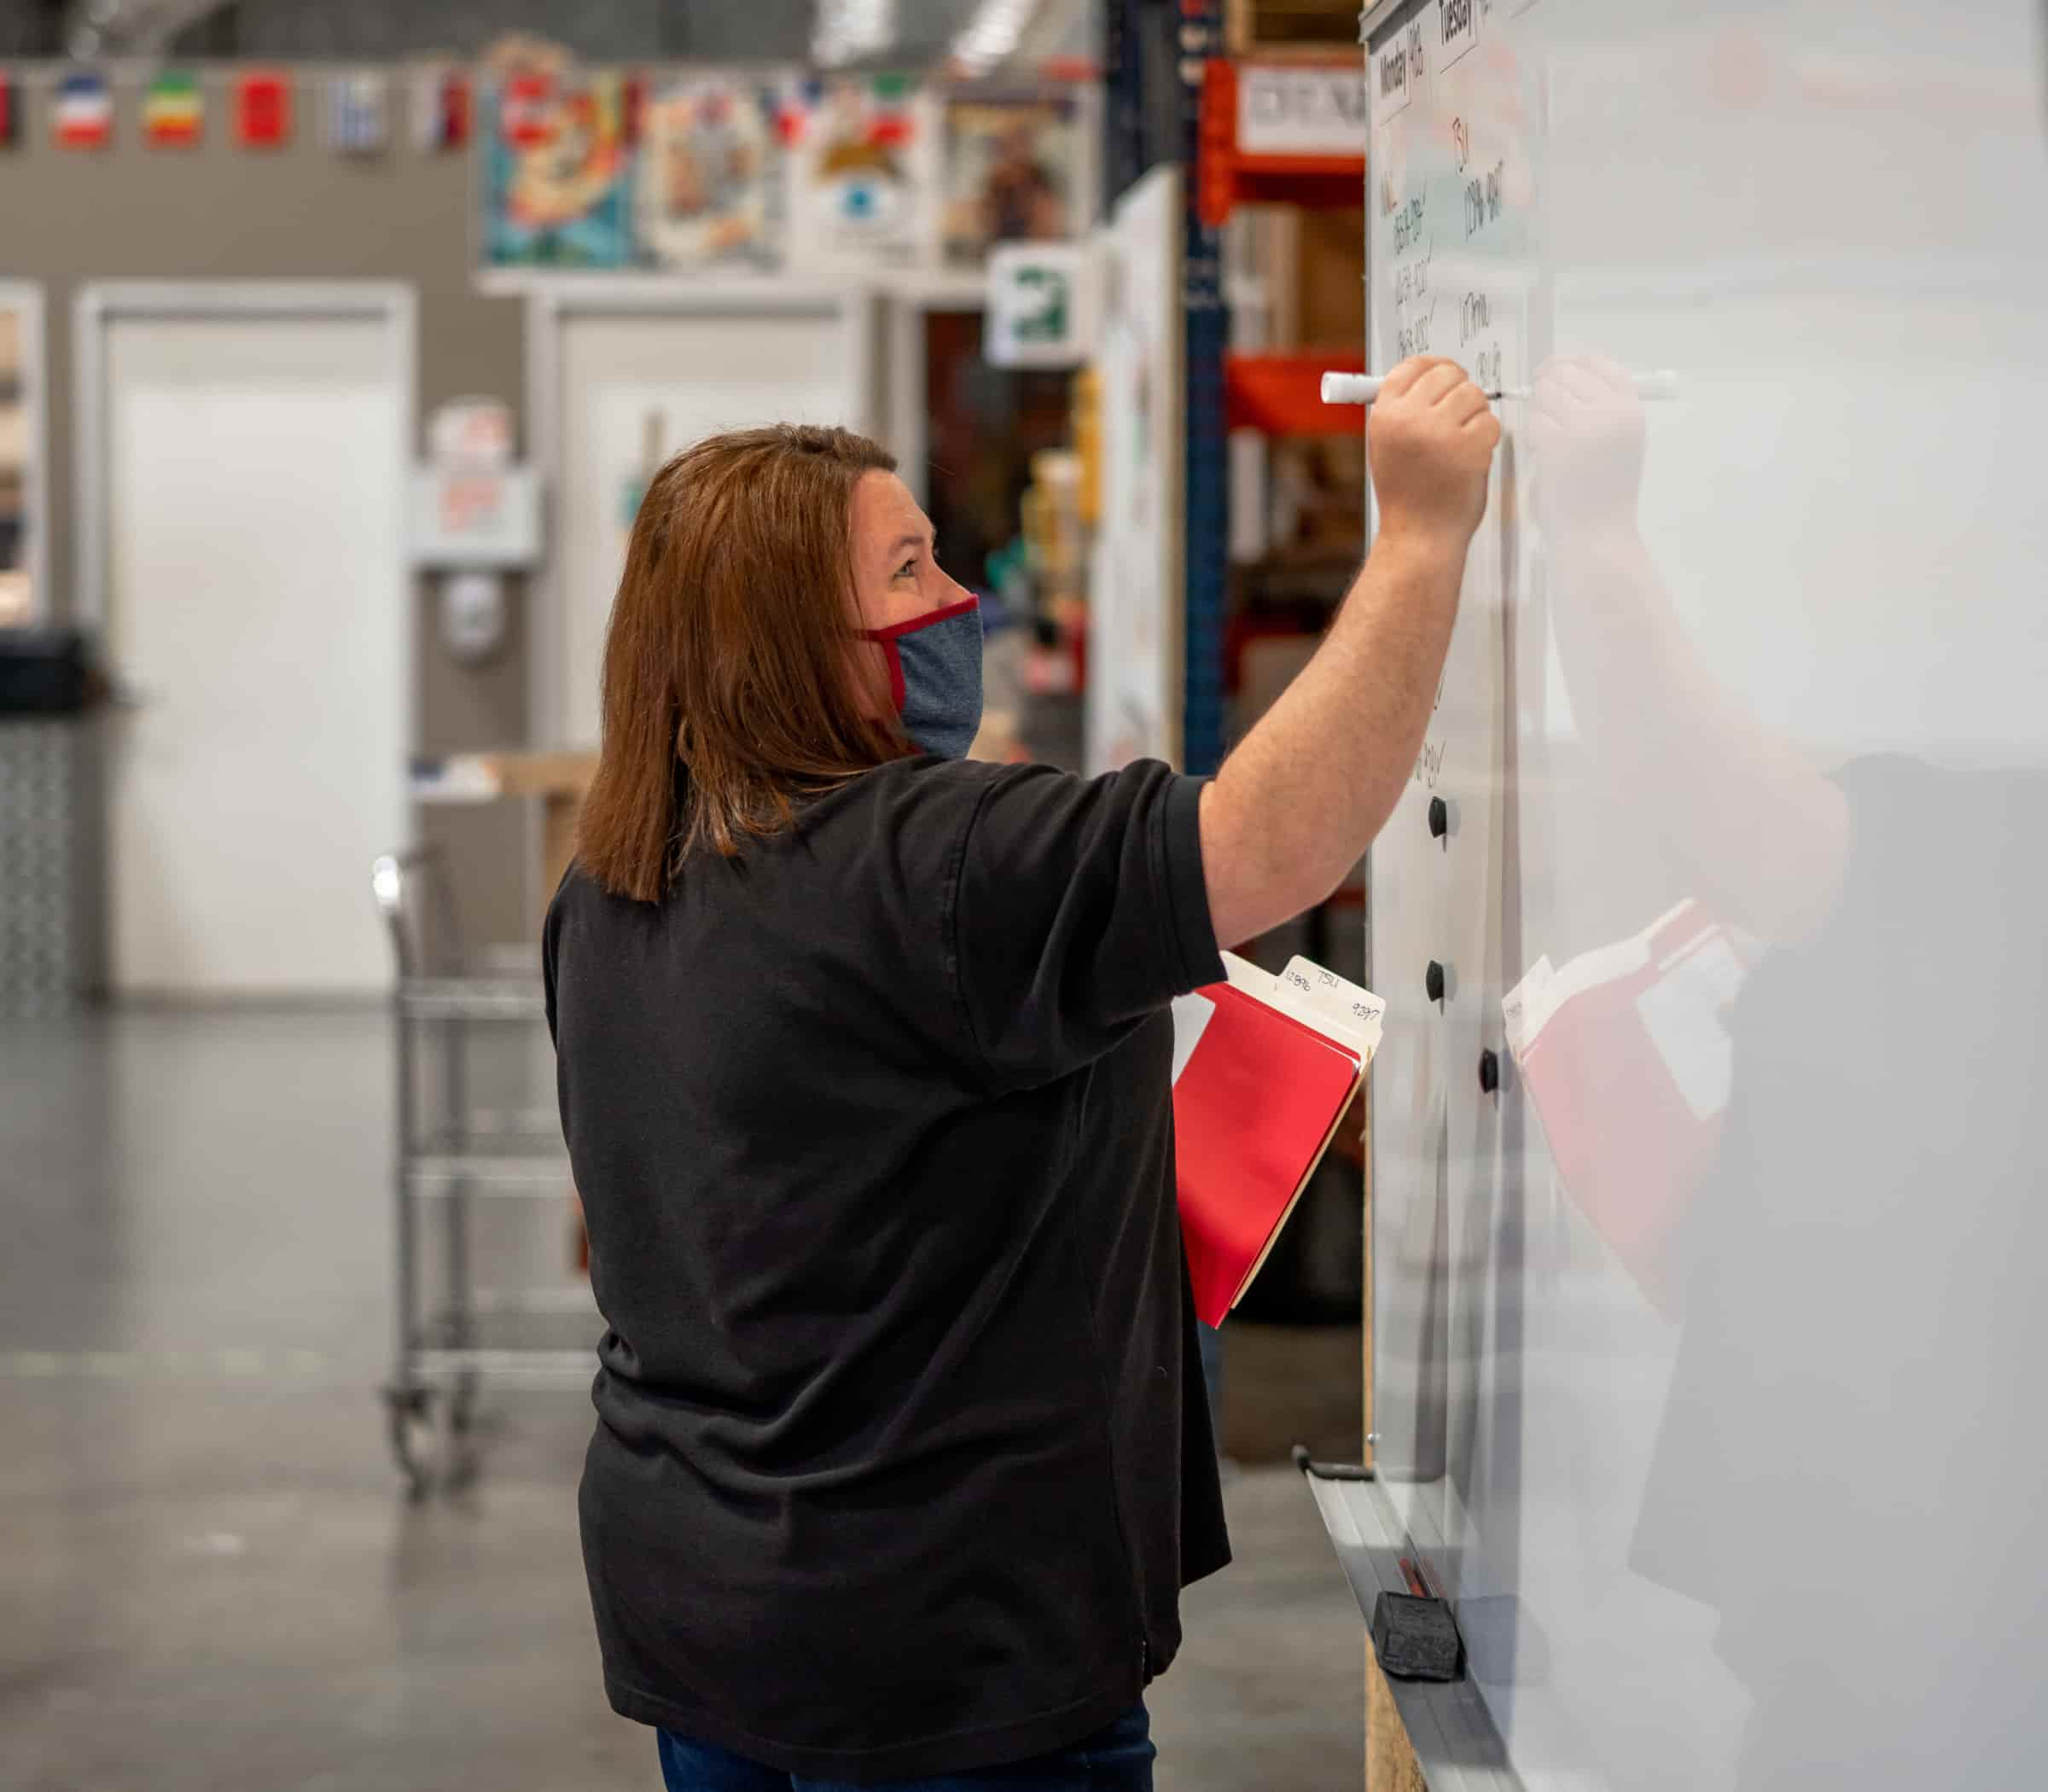 Woman writing on white board in furniture warehouse